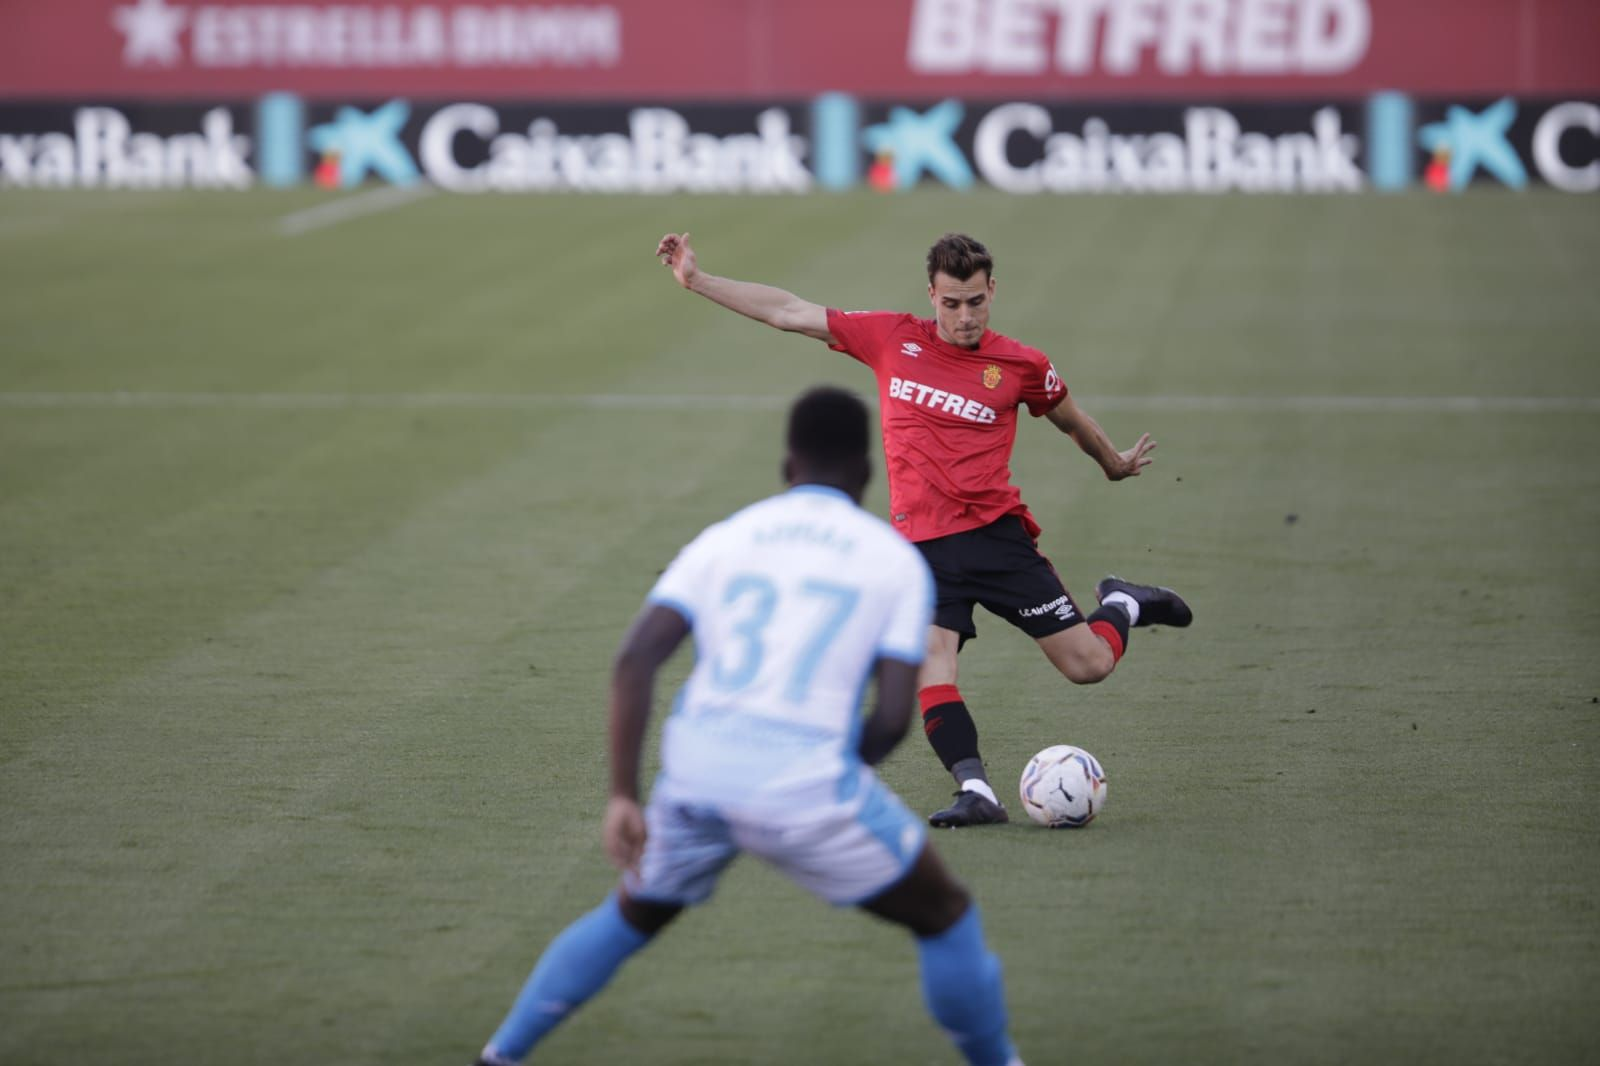 Real Mallorca - Lugo